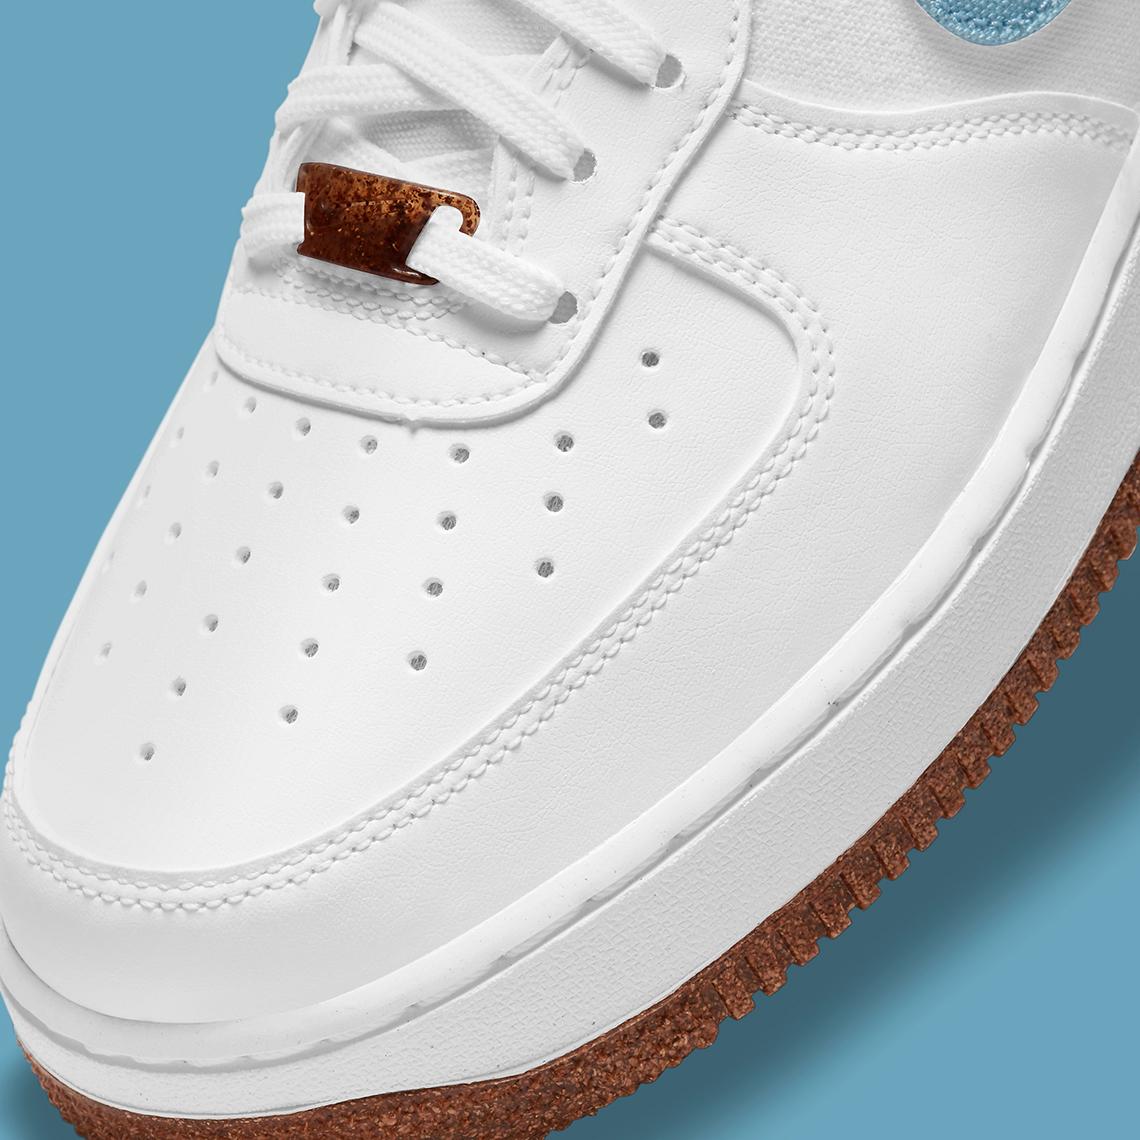 Nike Air Force 1 Indigo